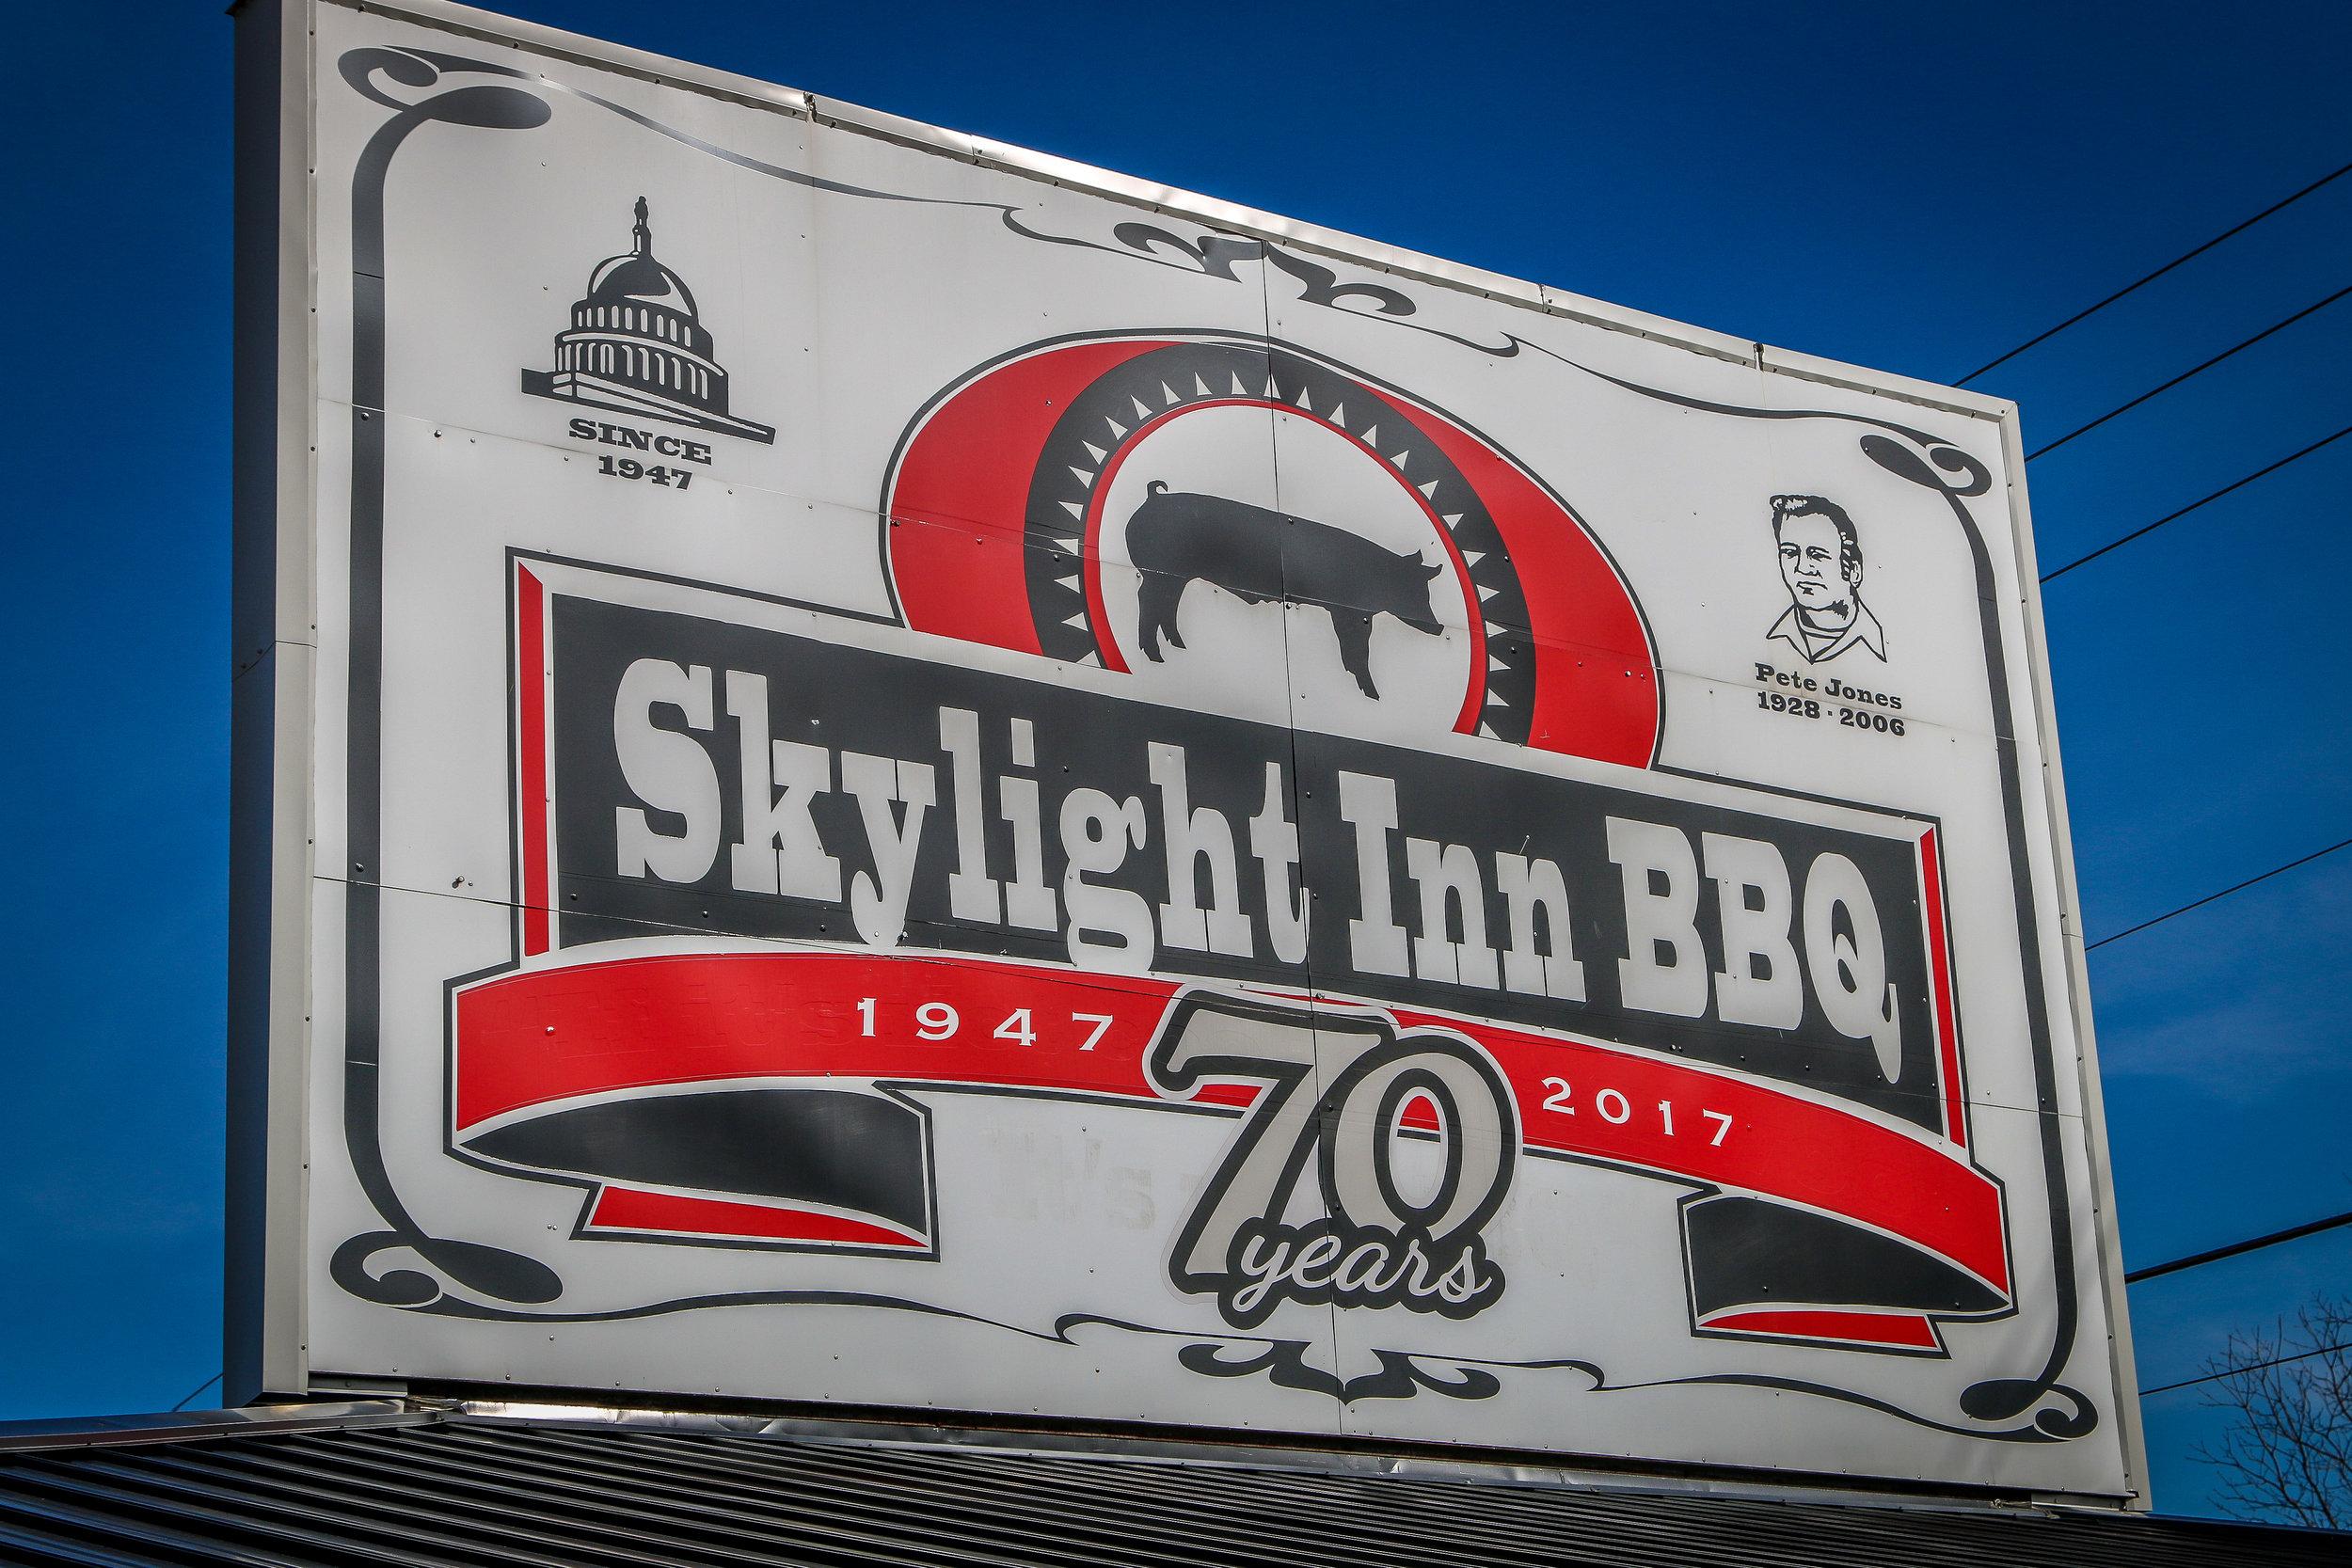 70+ Years of The Skylight Inn